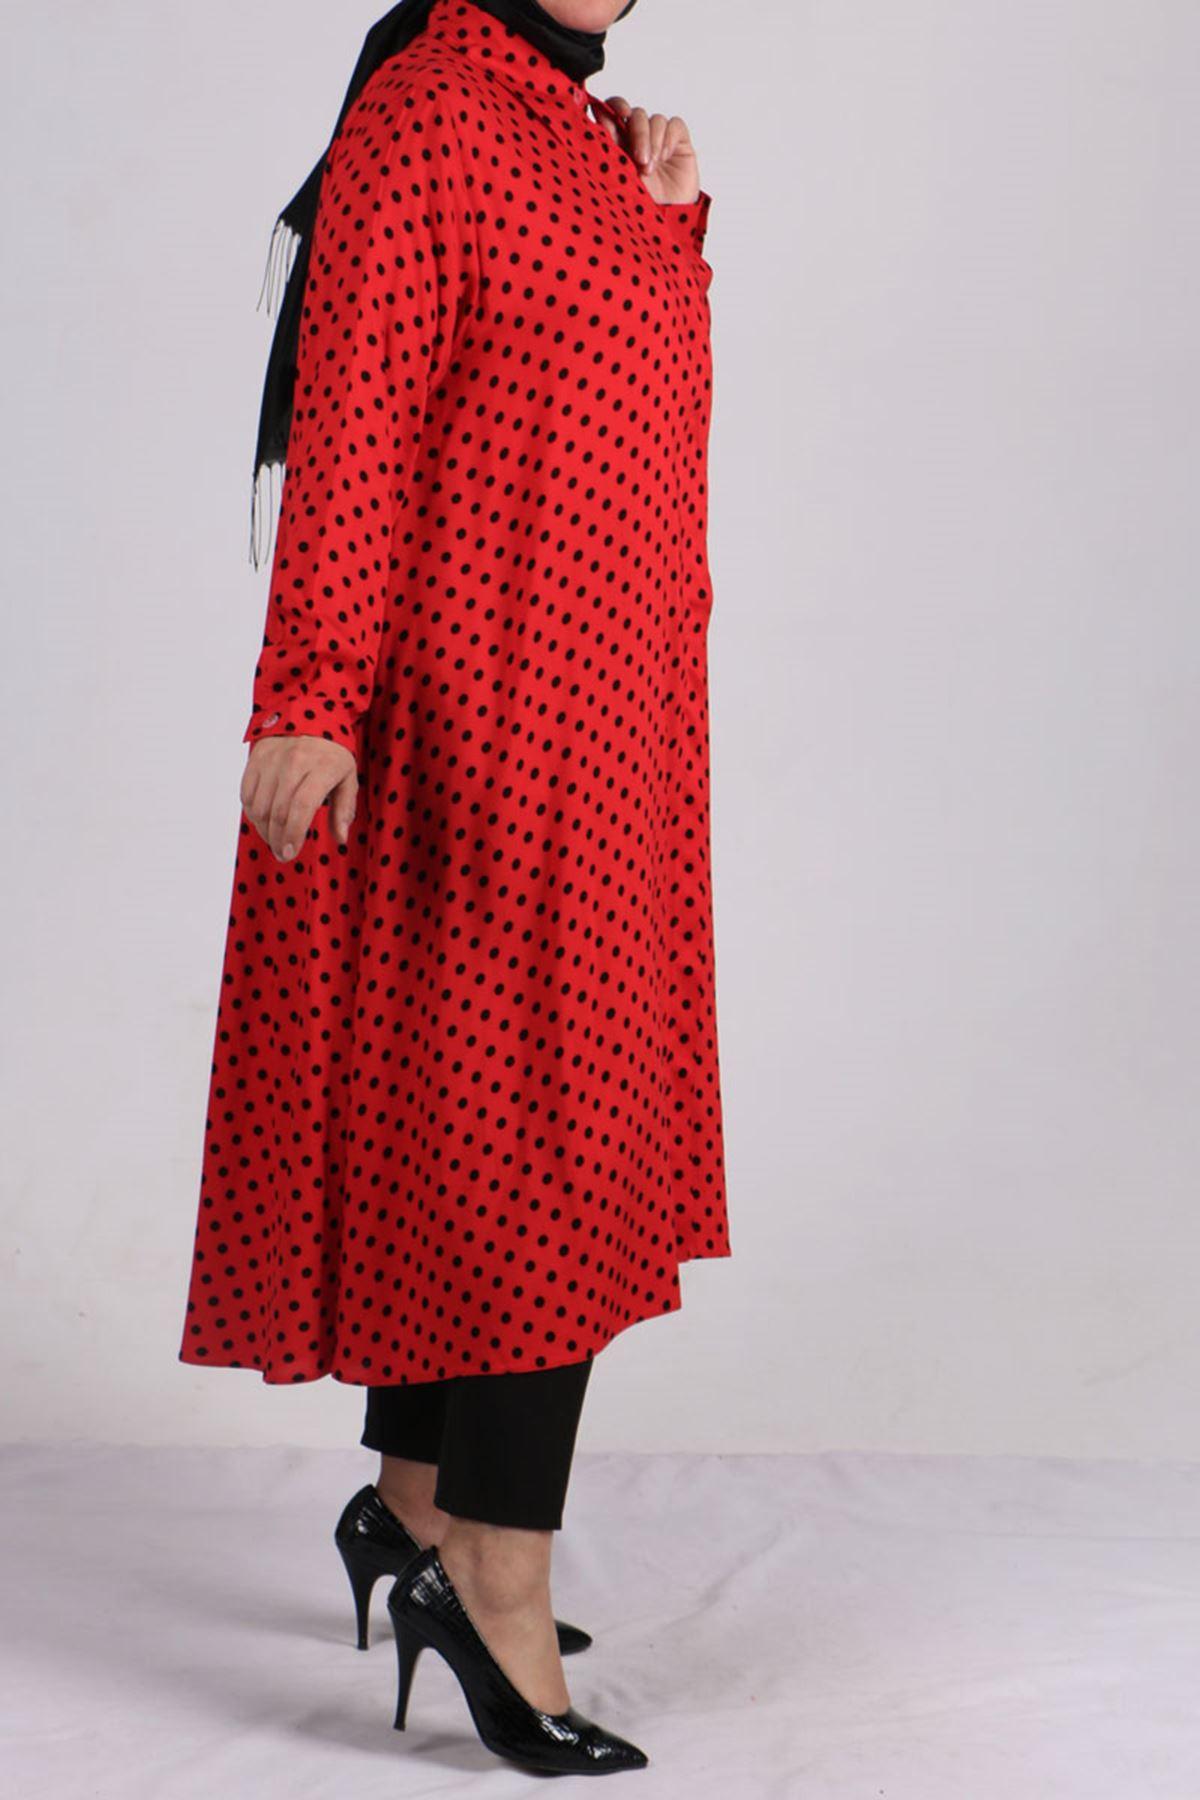 8461 Oversize Hidden Buttoned Shirt - Red Black Polka Dotted